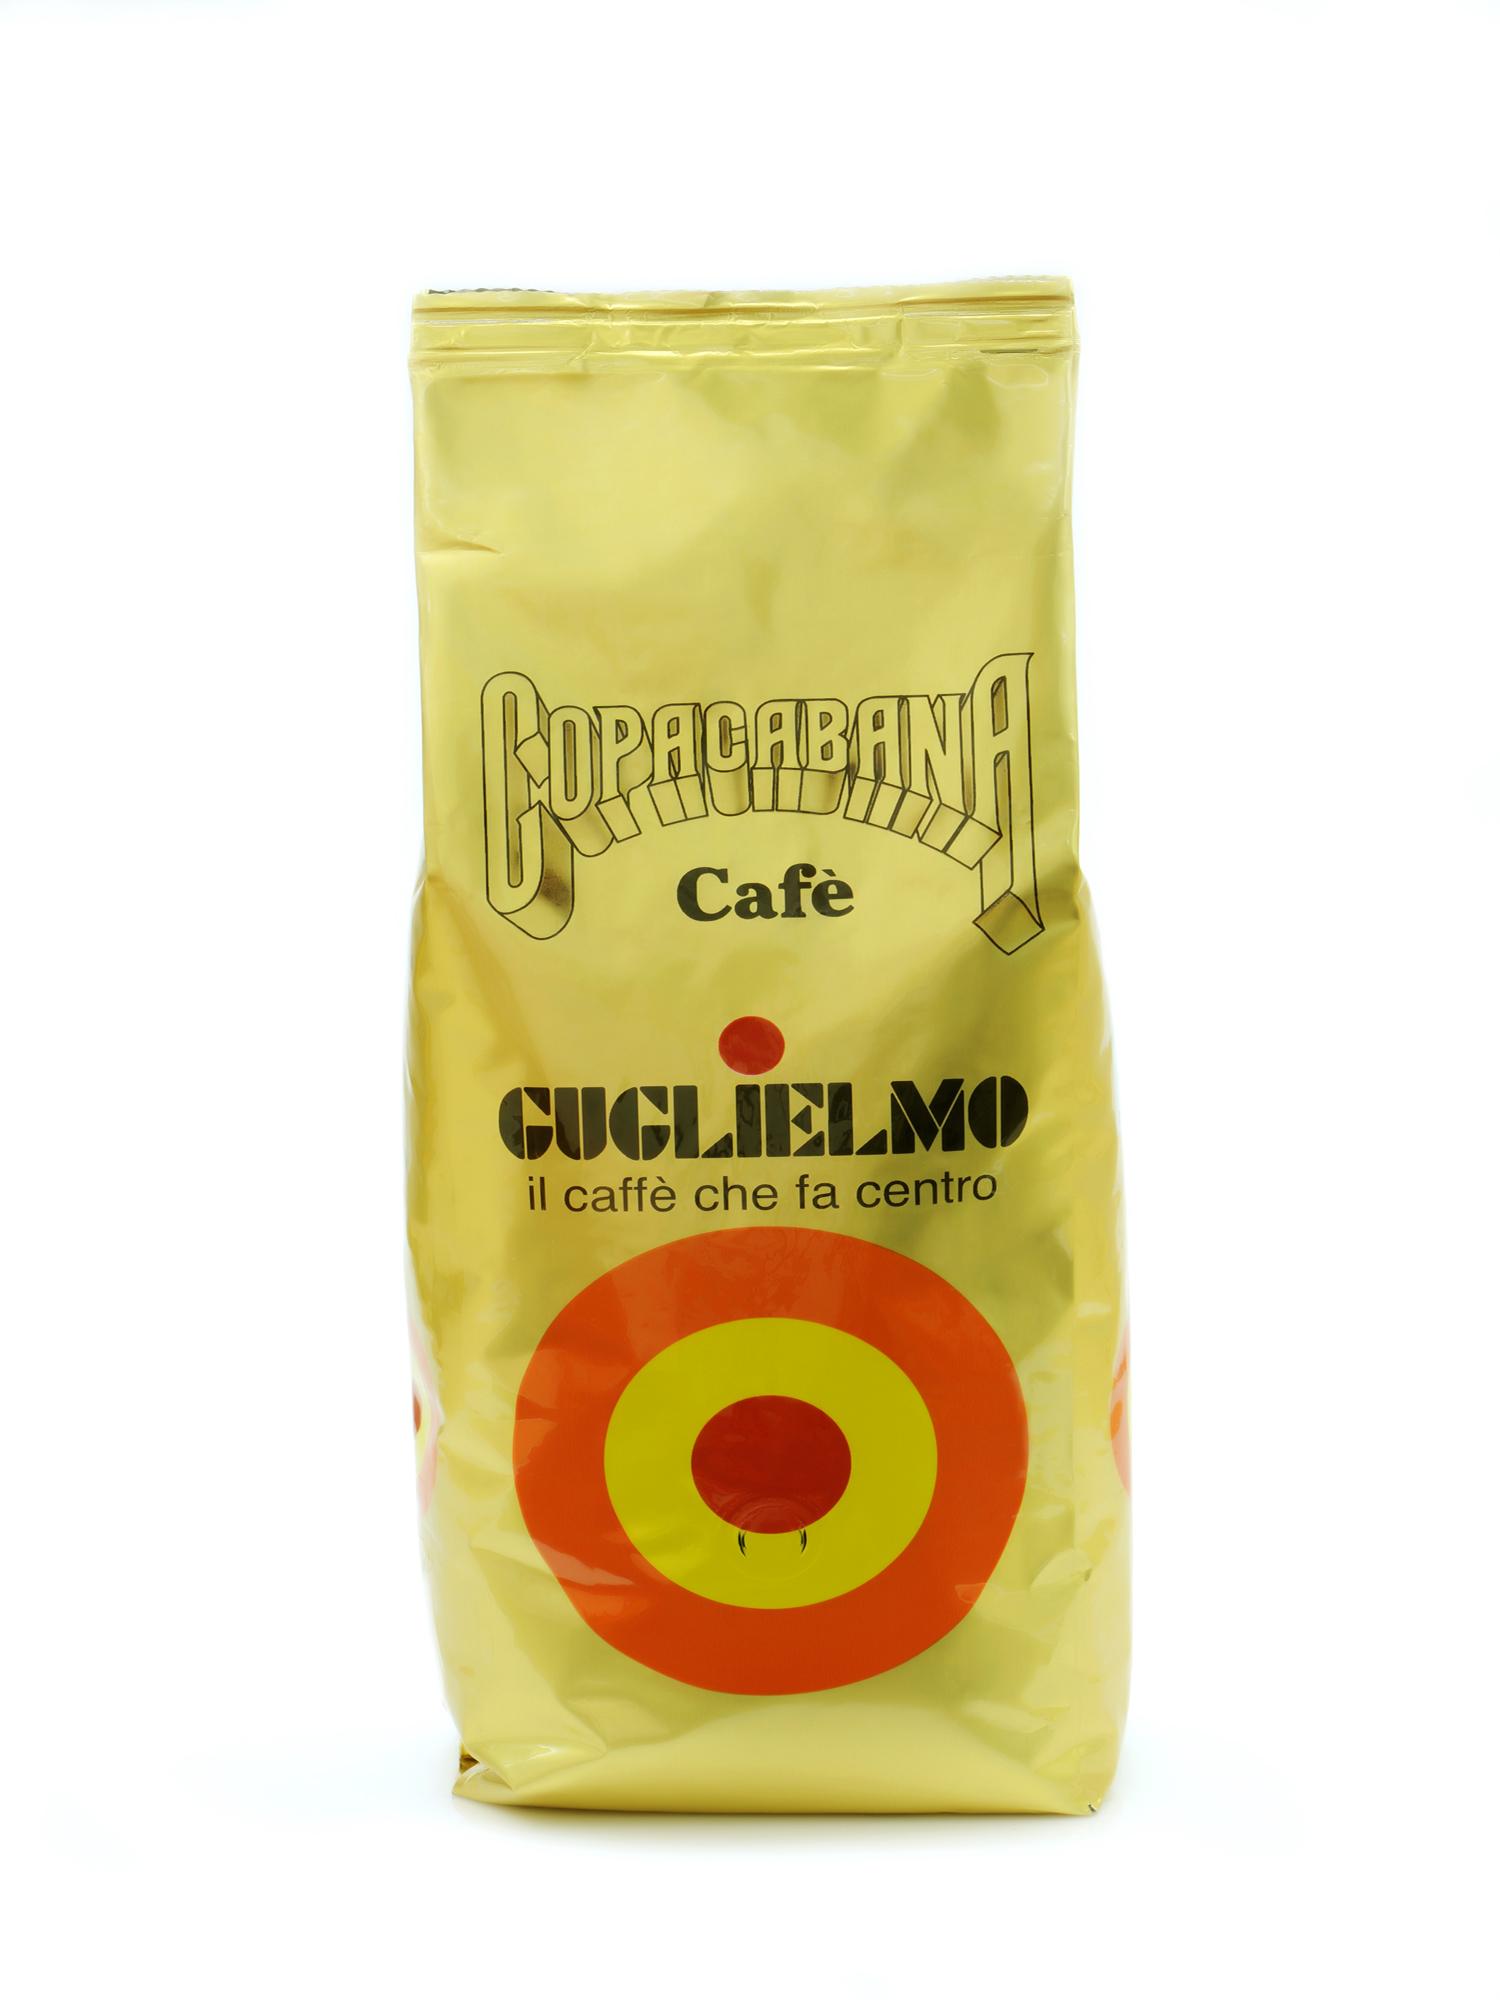 """Copacabana Caffè"", 1 kg Packung Guglielmo"